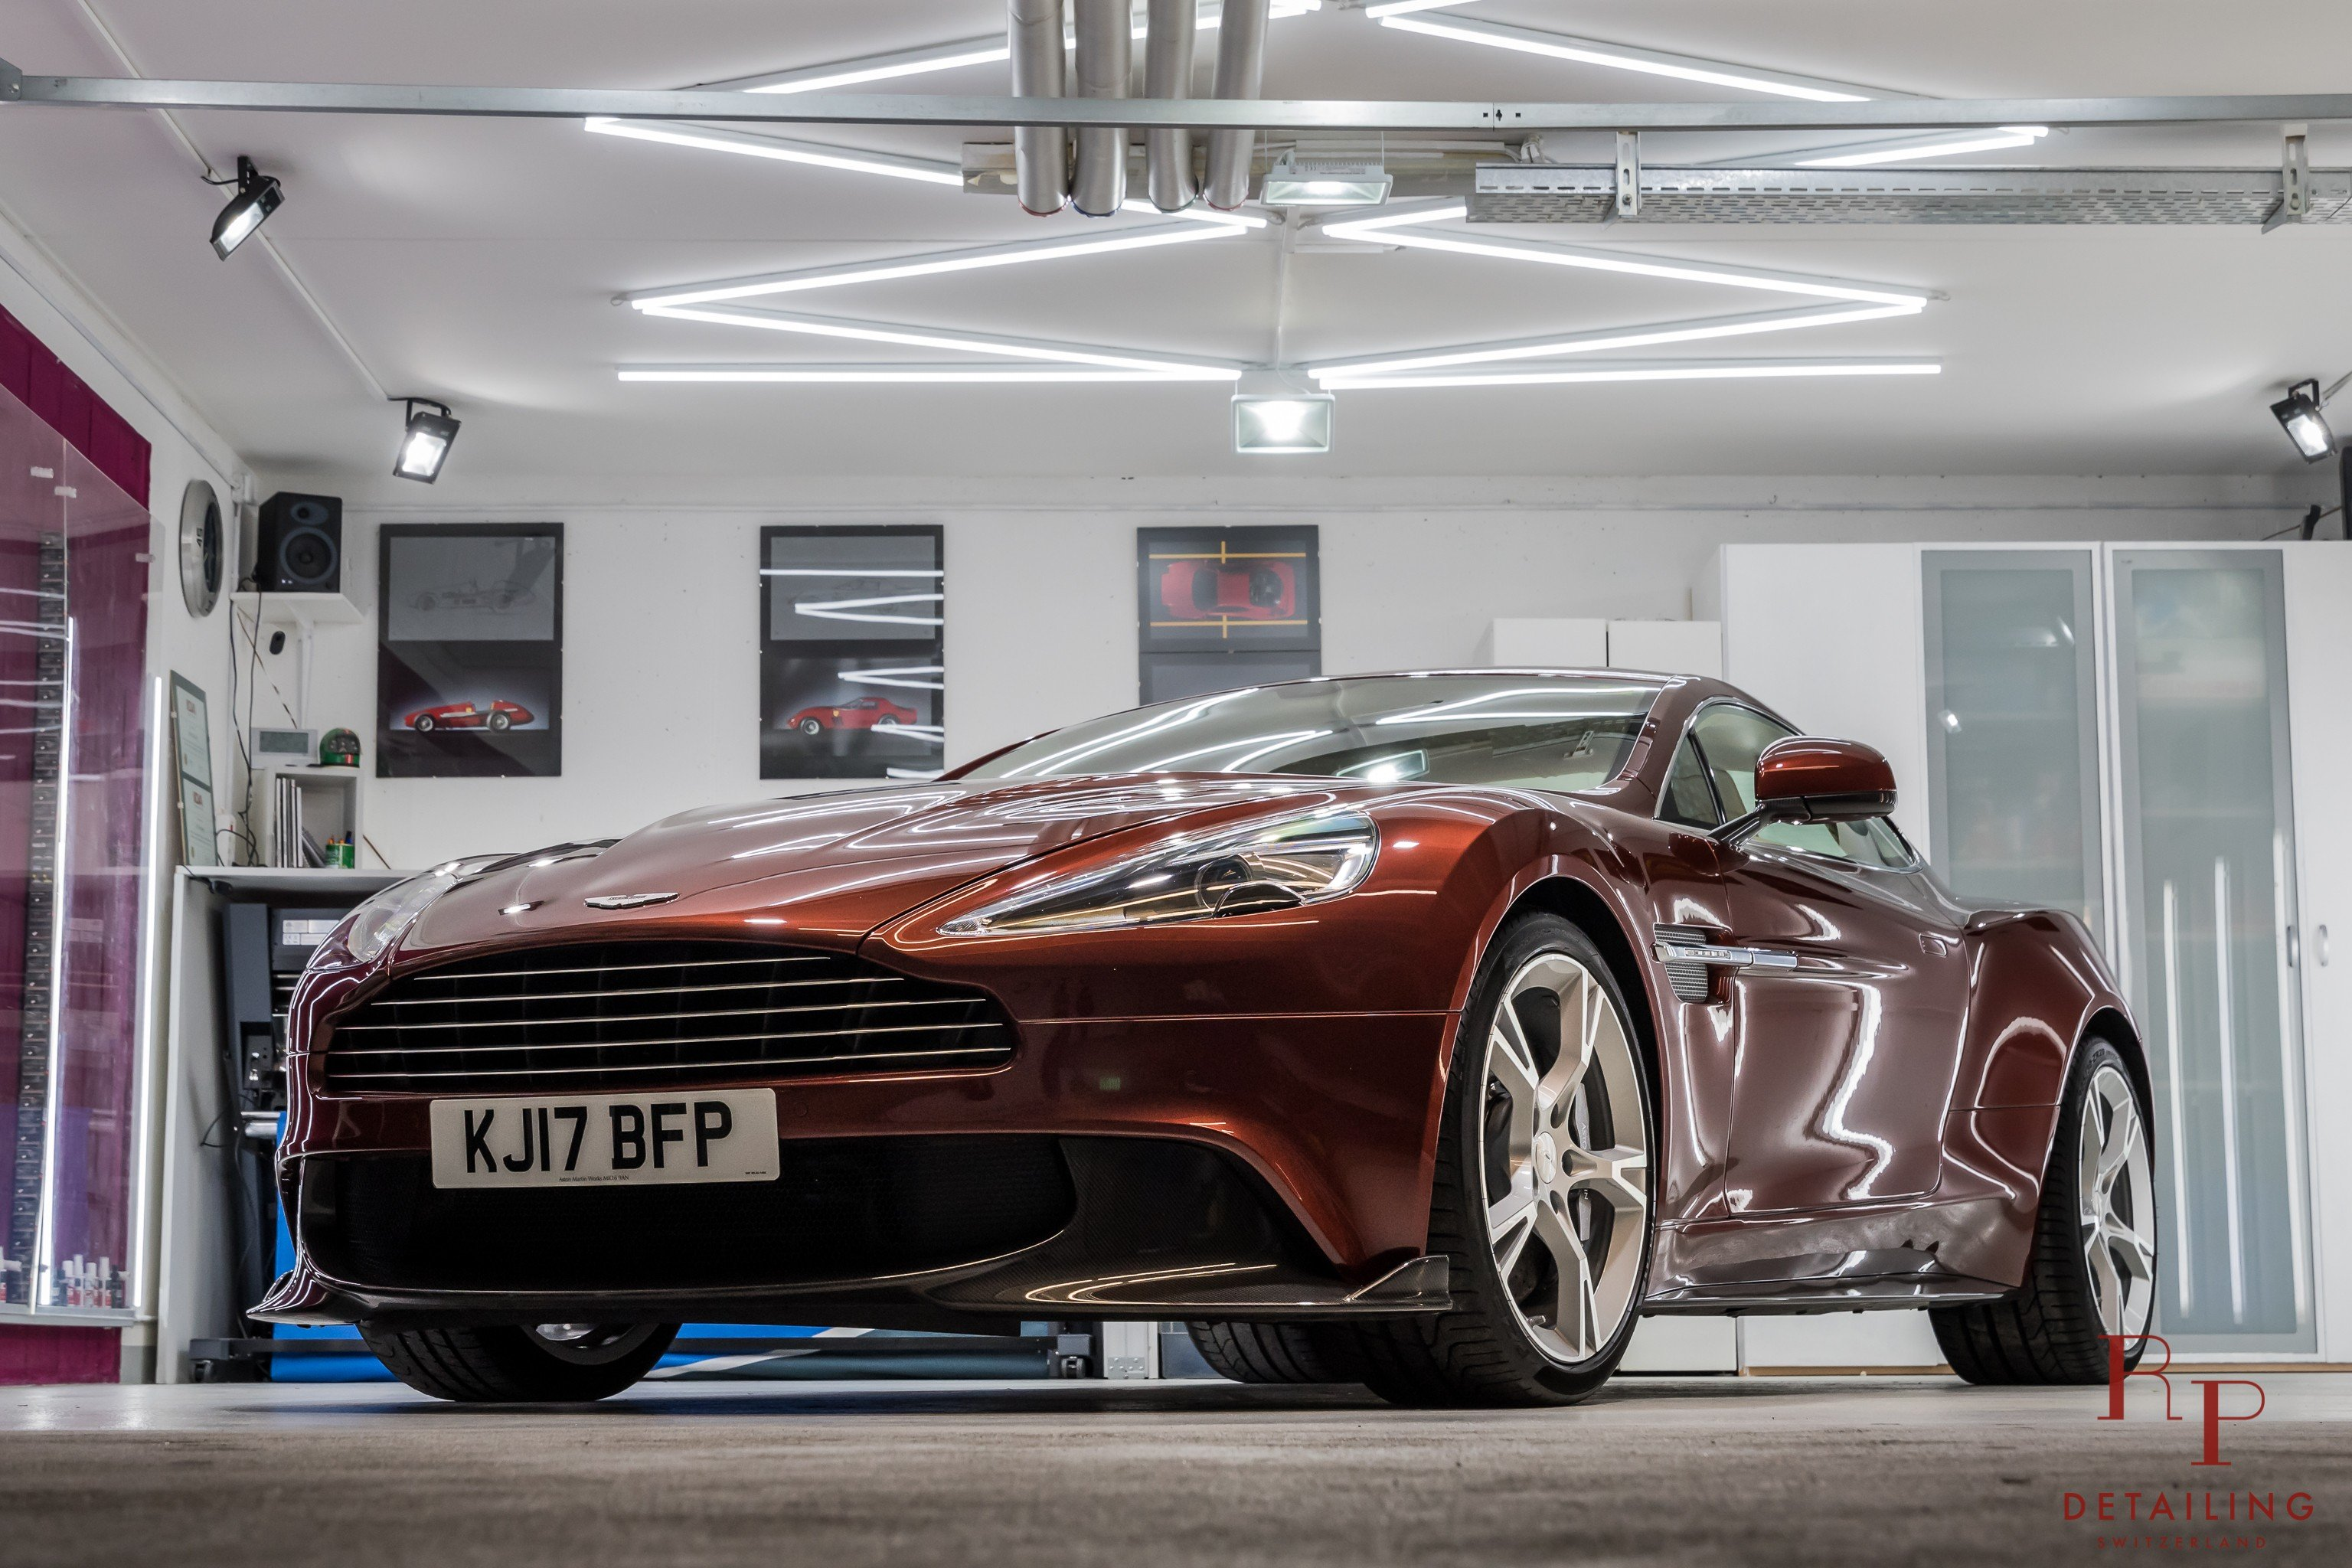 Aston Martin Vanquish S by RP-DETAILING